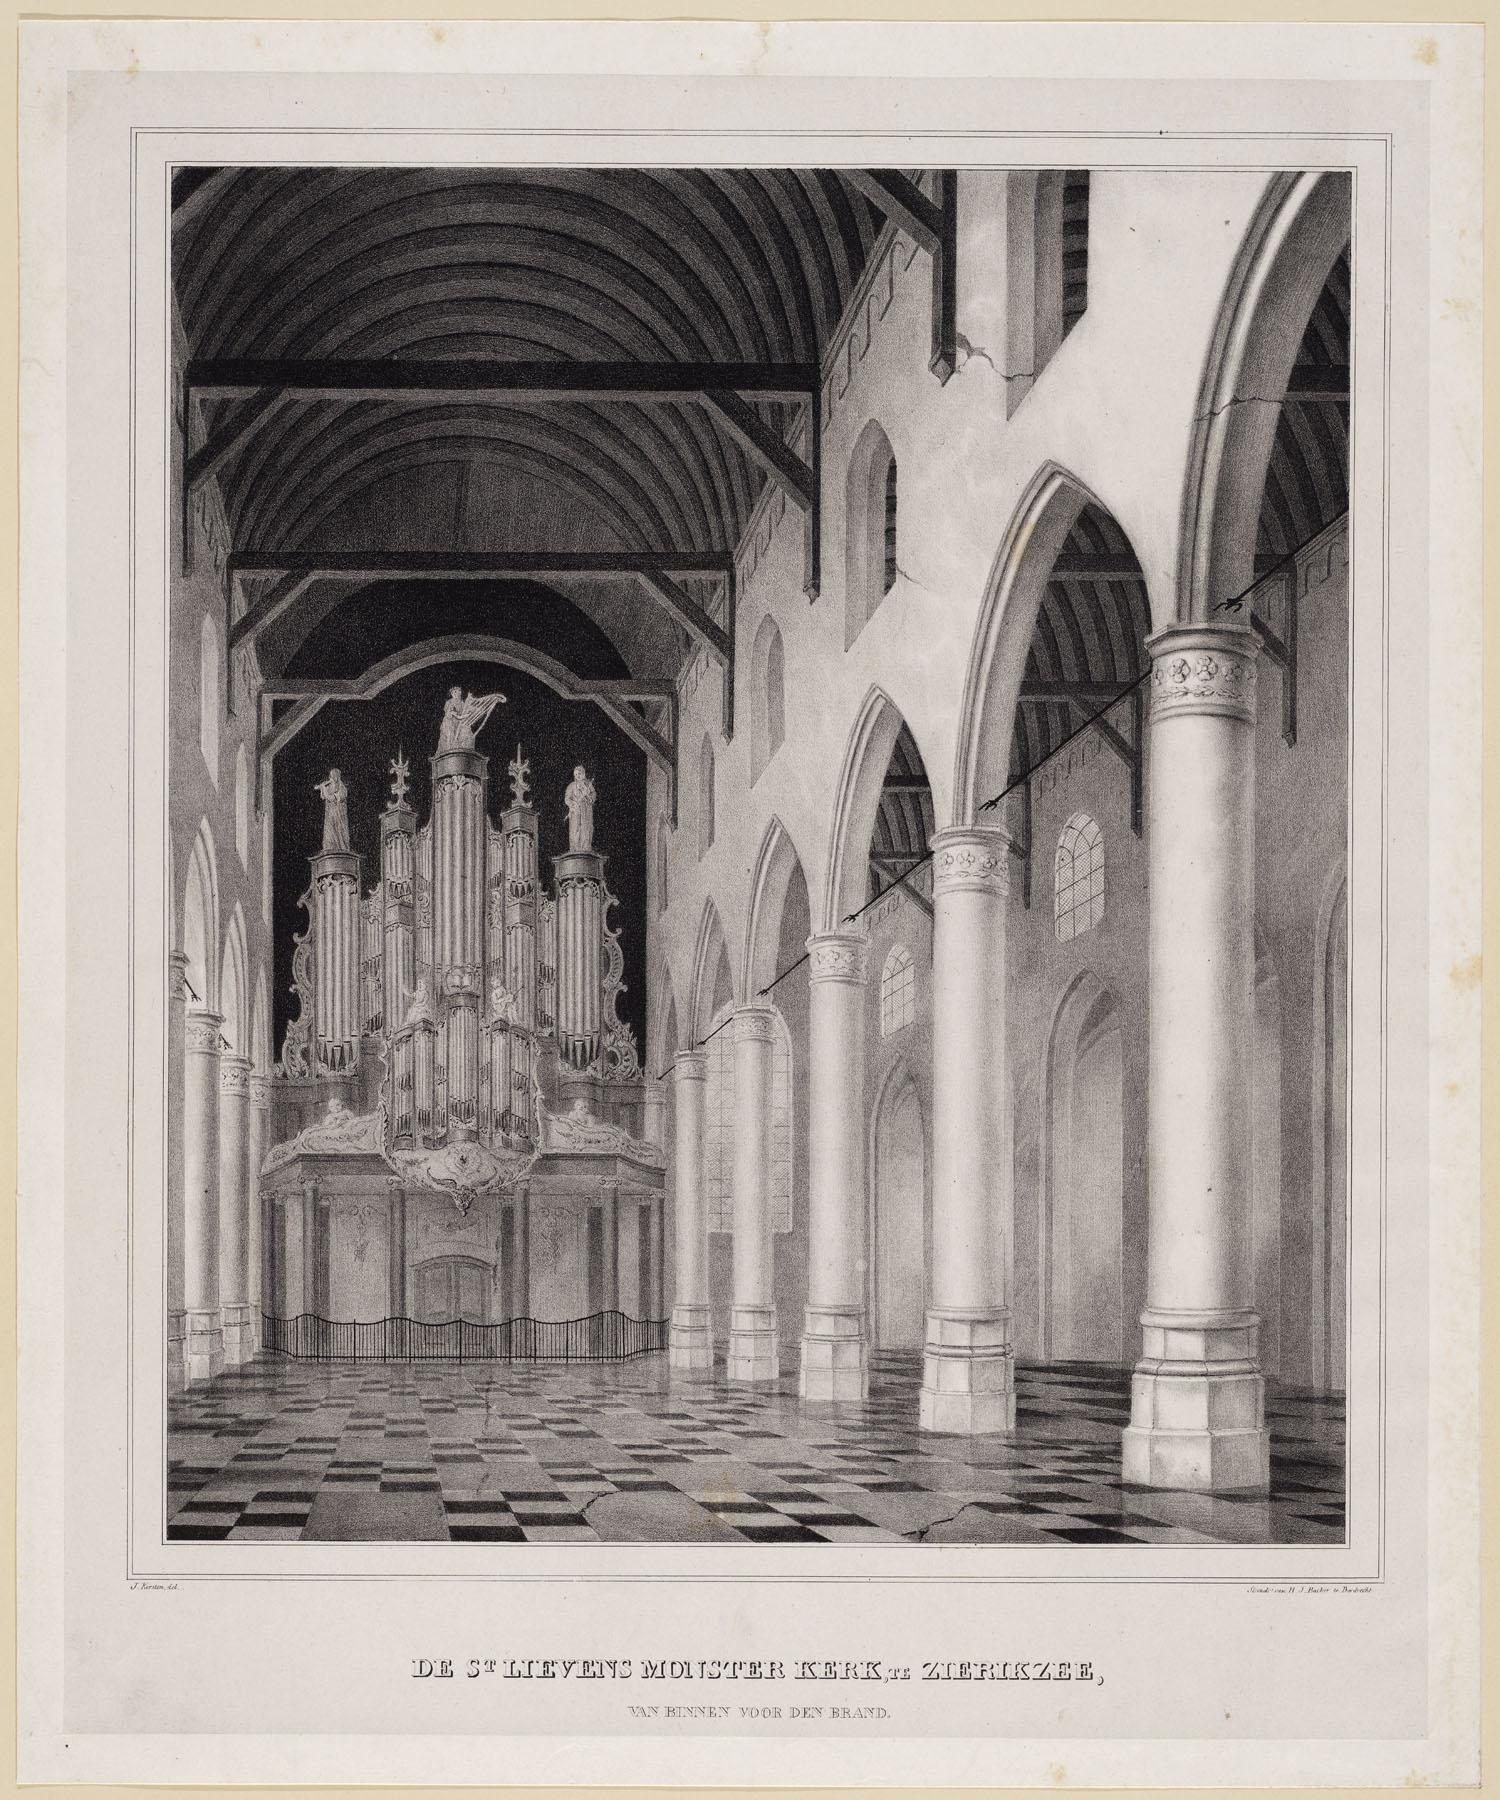 Interieur st Lievensmonsterkerk - Zalig-Zeeland.com